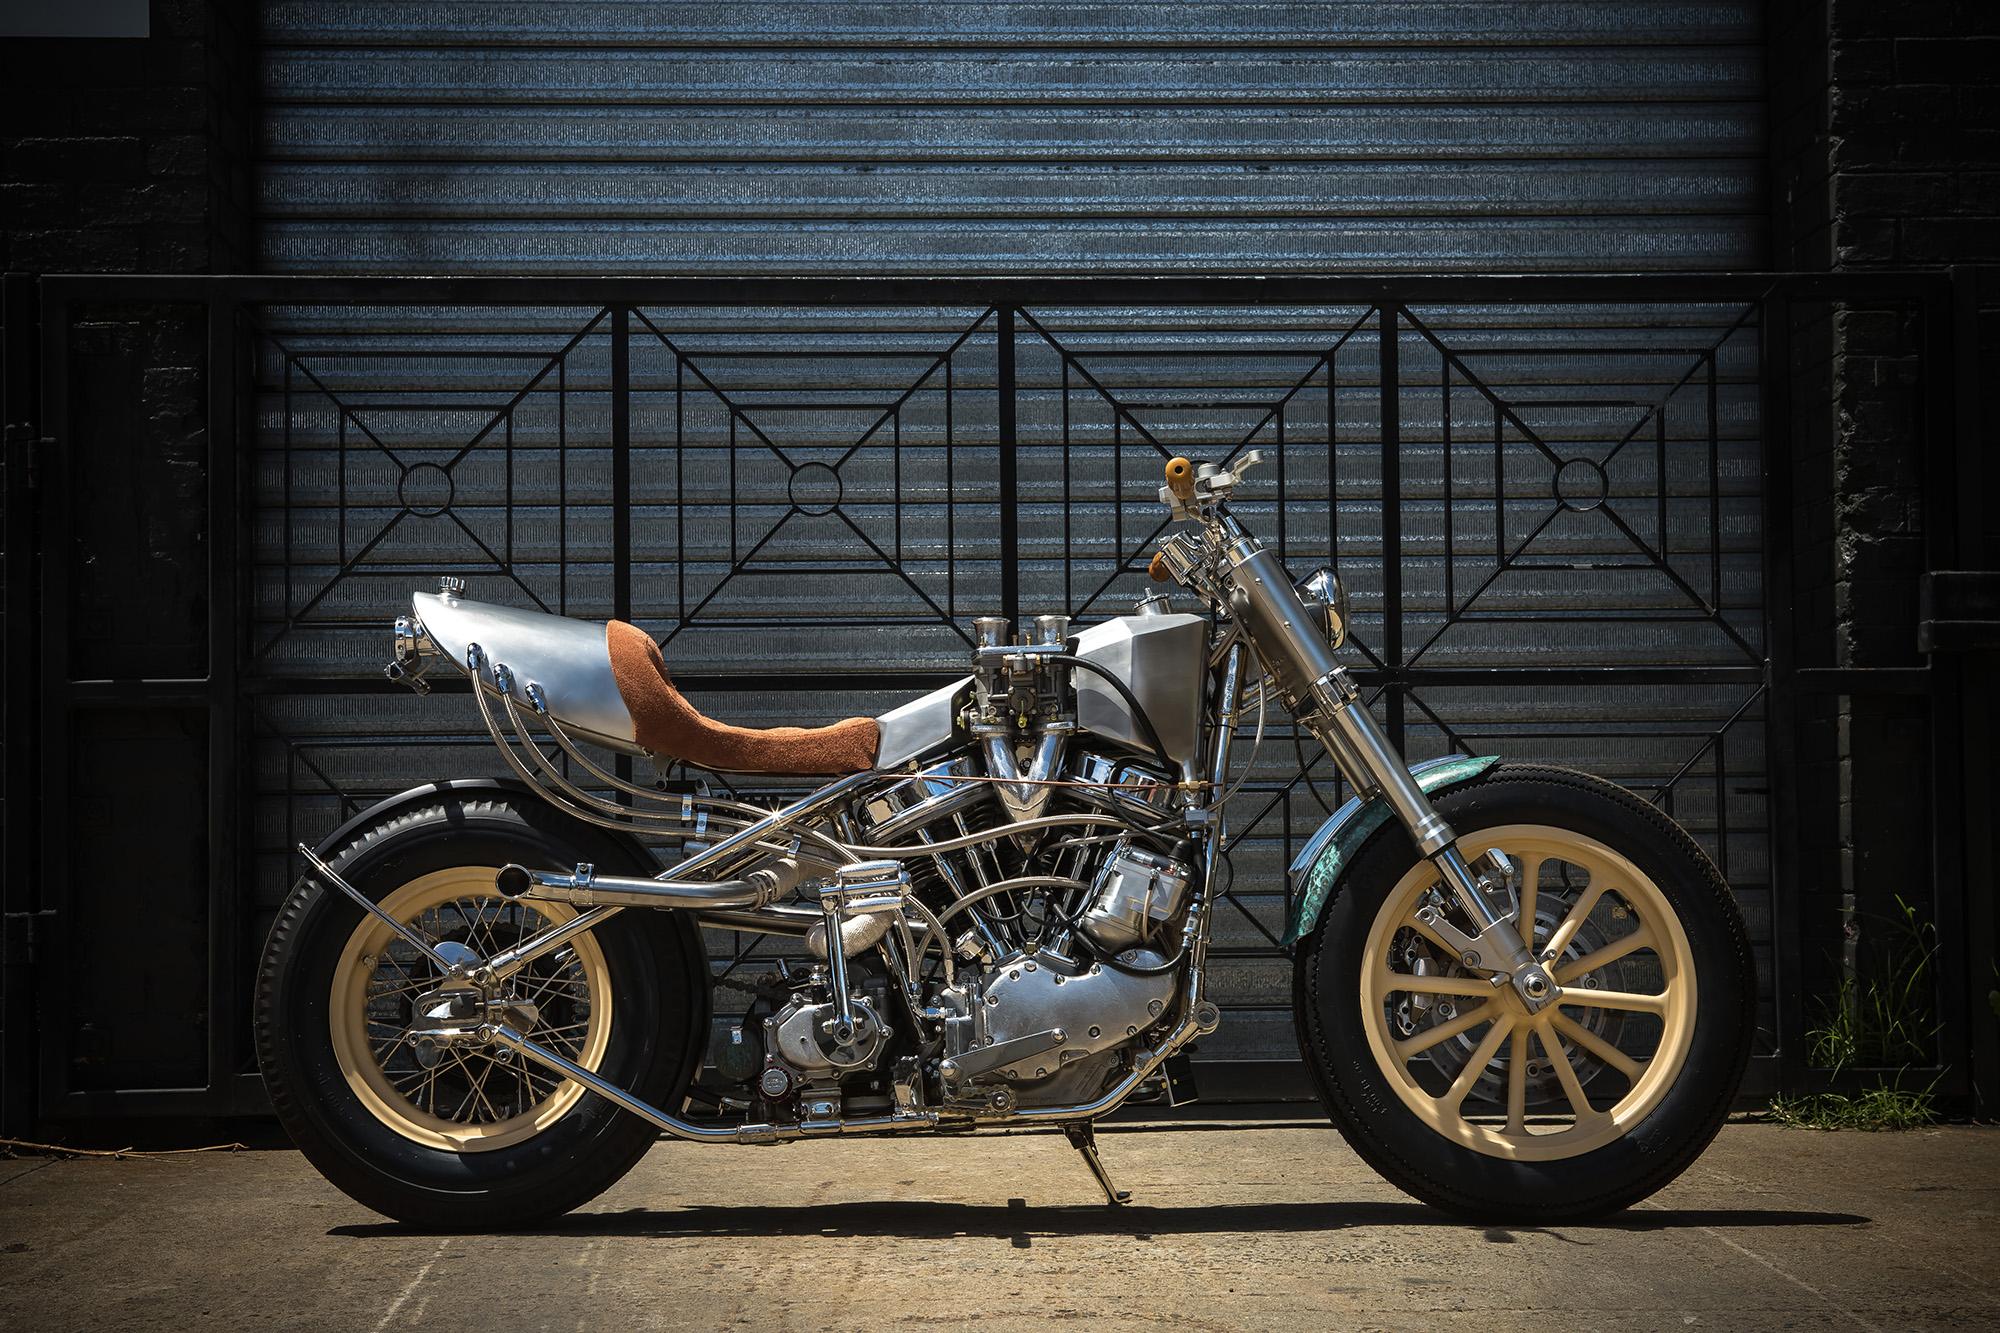 Hot Rod Harley >> Hot Rod Harley By Mlr Custom Coachbuilder Pipeburn Com